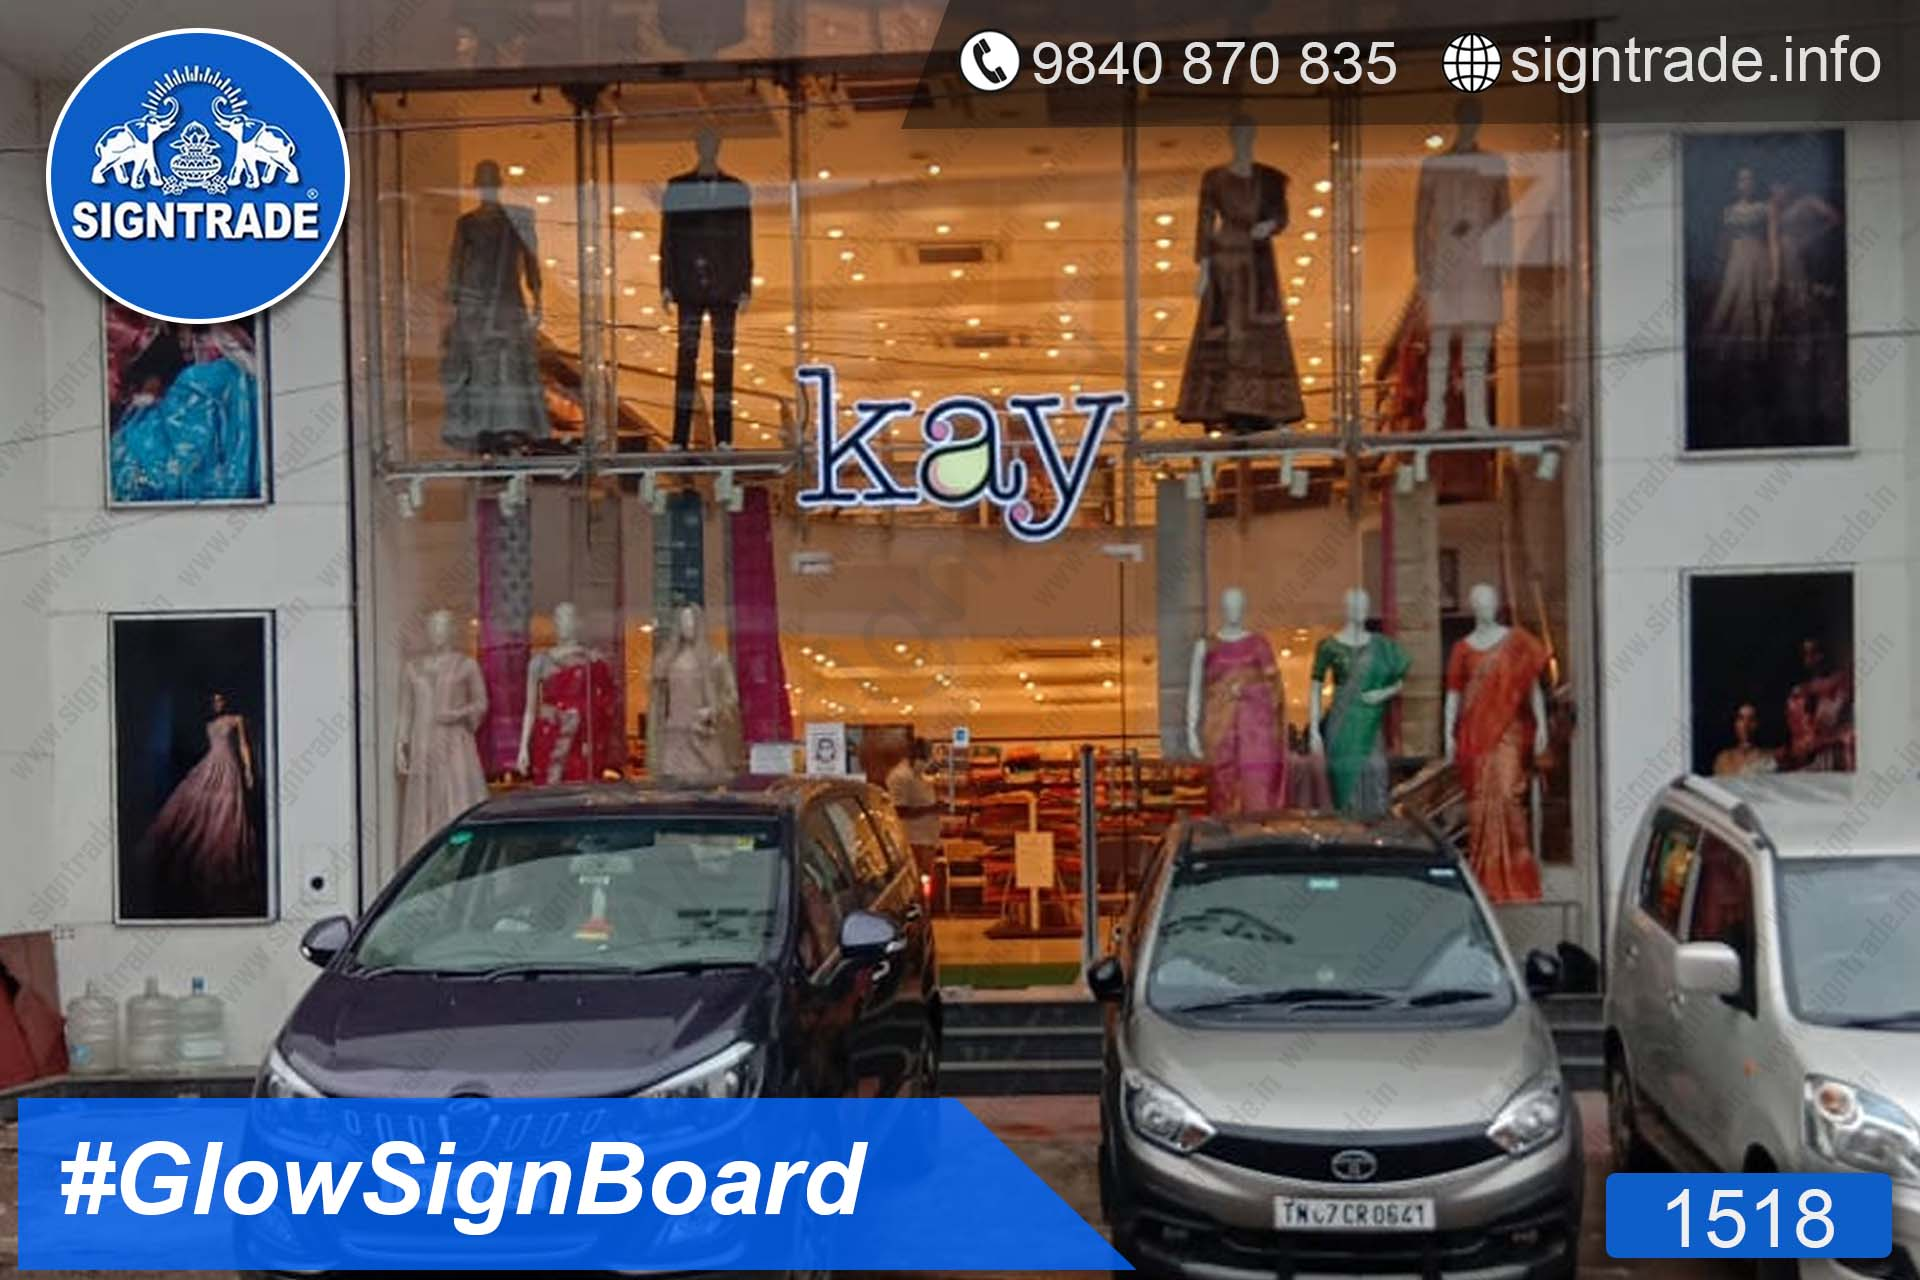 Kay The Fashion Bay, Purasaiwakkam, Chennai - SIGNTRADE - Acrylic ACP, LED Sign Board Manufacturers in Chennai